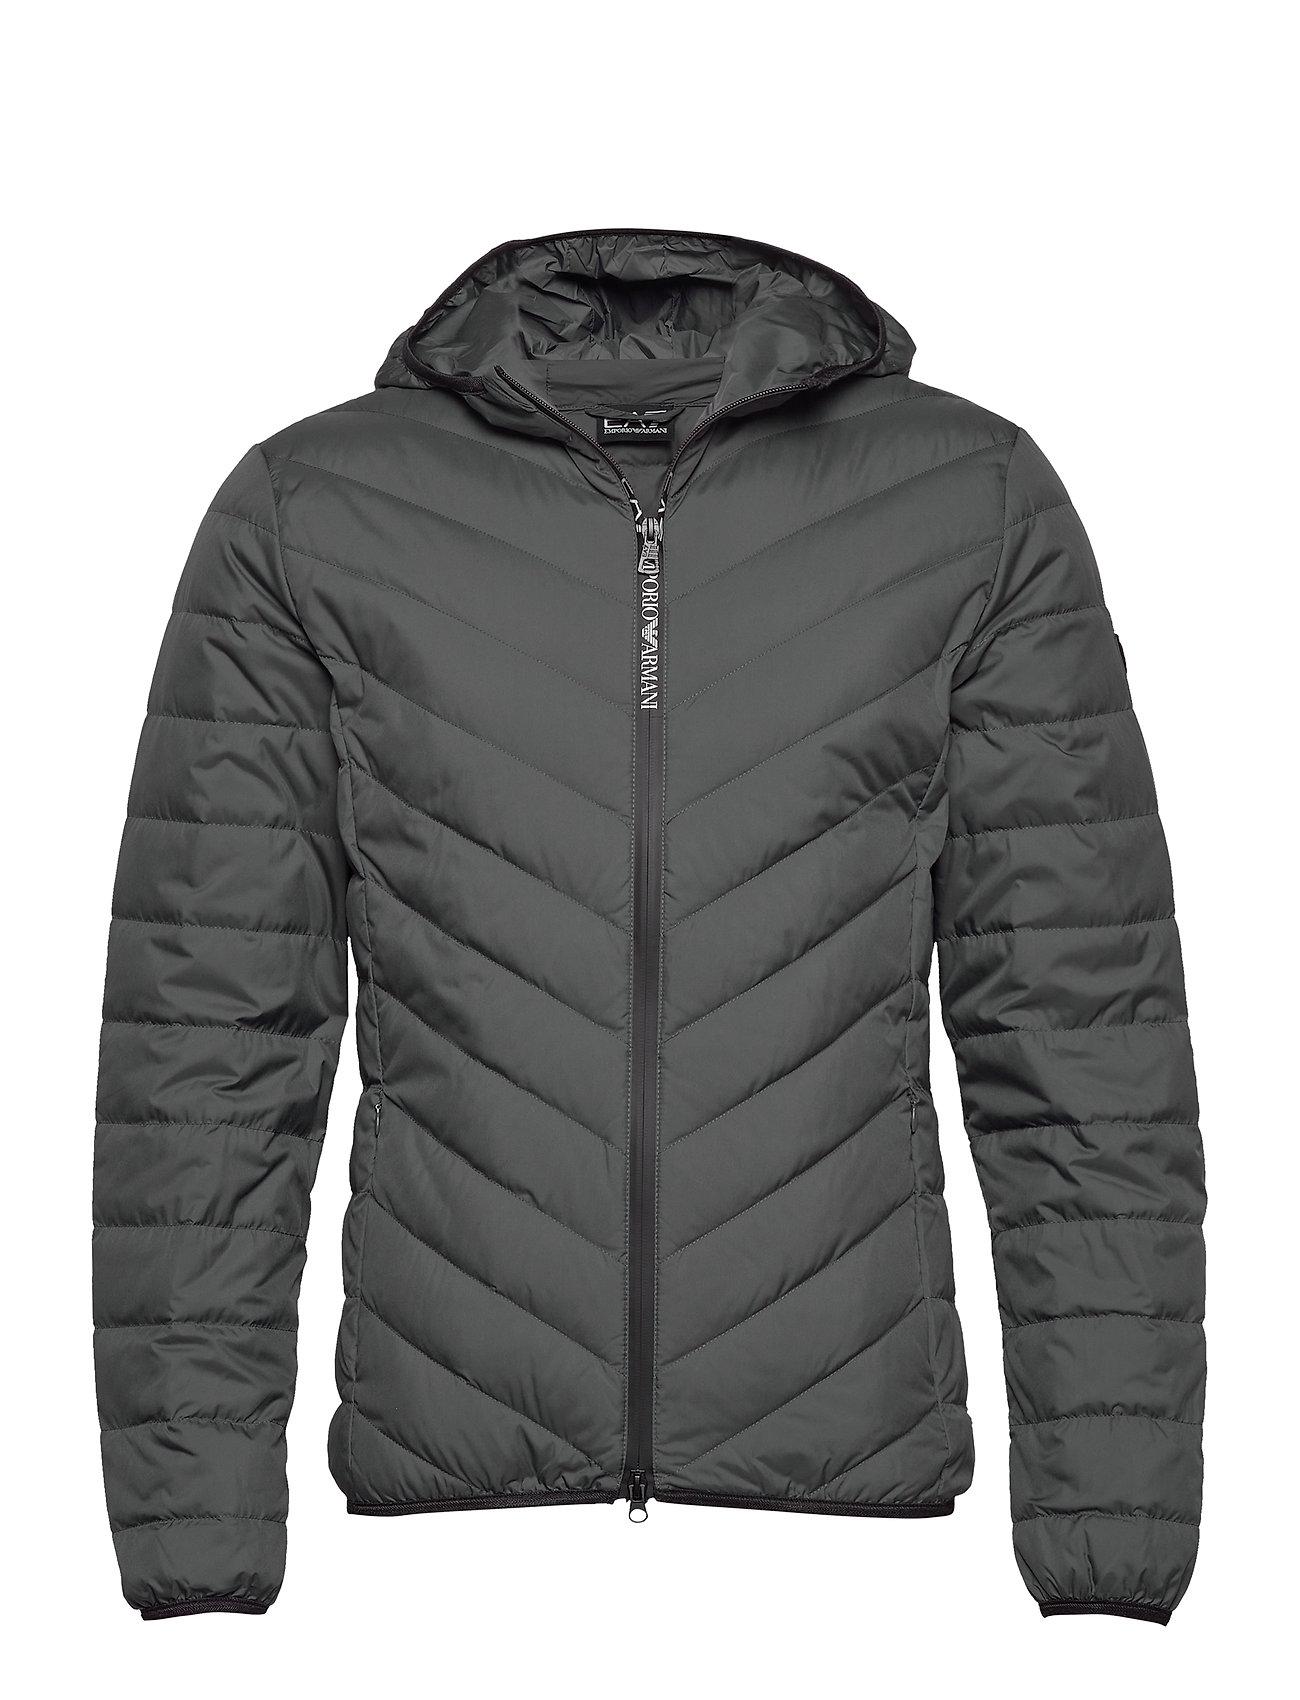 Image of Jacket Foret Jakke Grå EA7 (3435719837)